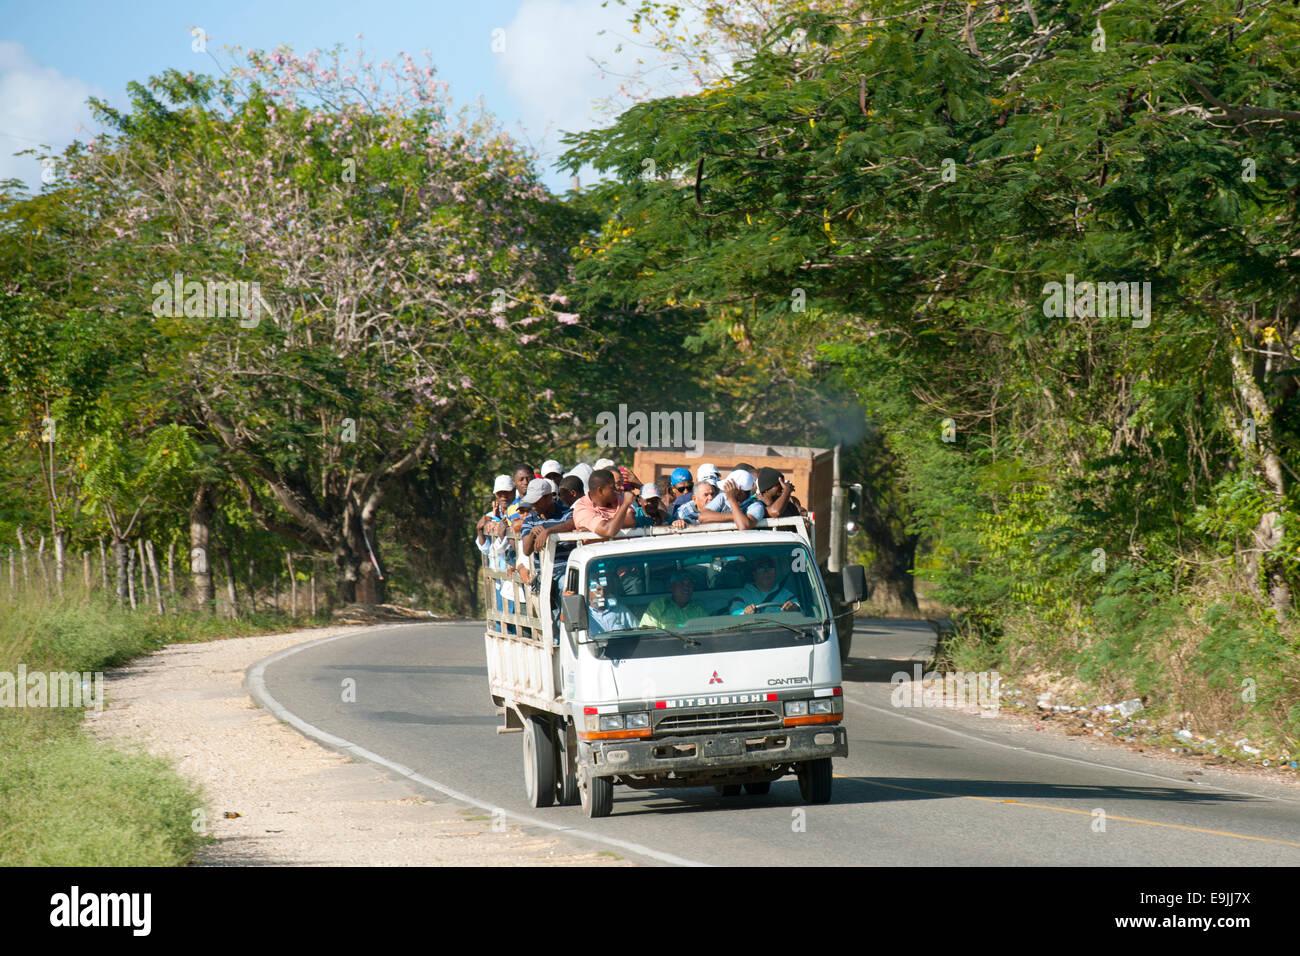 Dominikanische Republik, Osten, Lastwagen mit Arbeitern bei La Romana - Stock Image